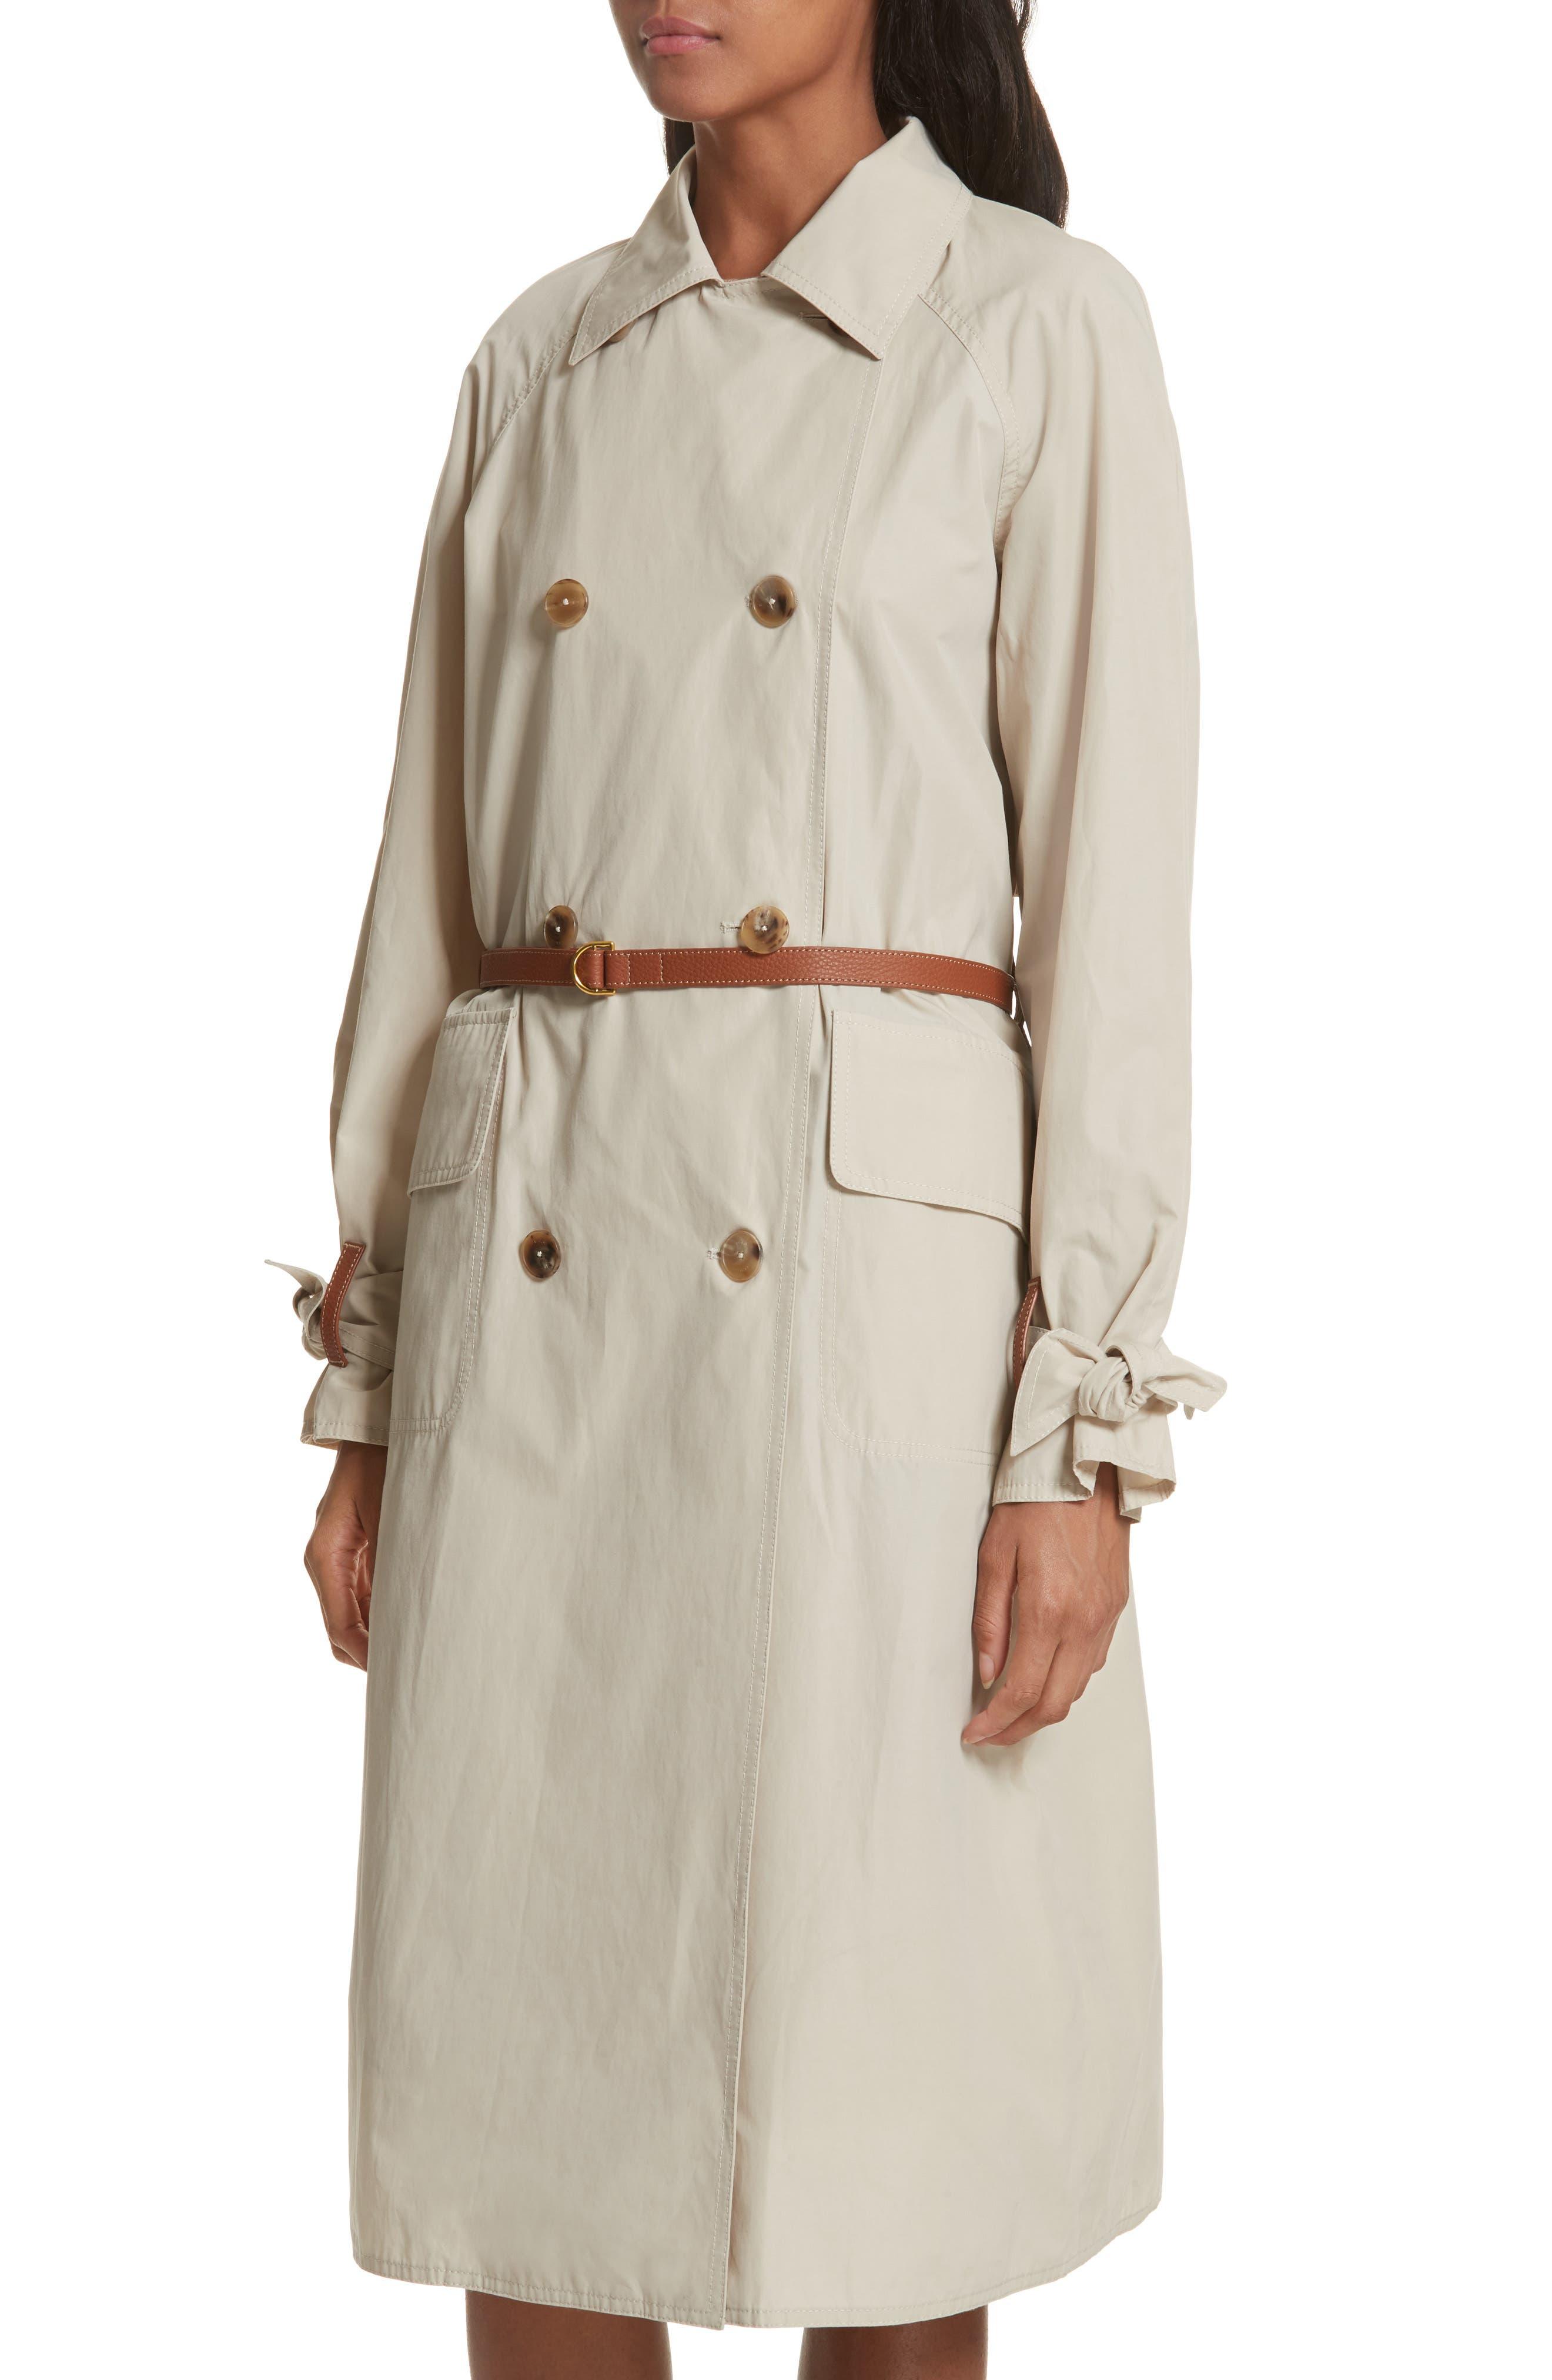 Marielle Leather Trim Trench Coat,                             Alternate thumbnail 4, color,                             Pale Stone